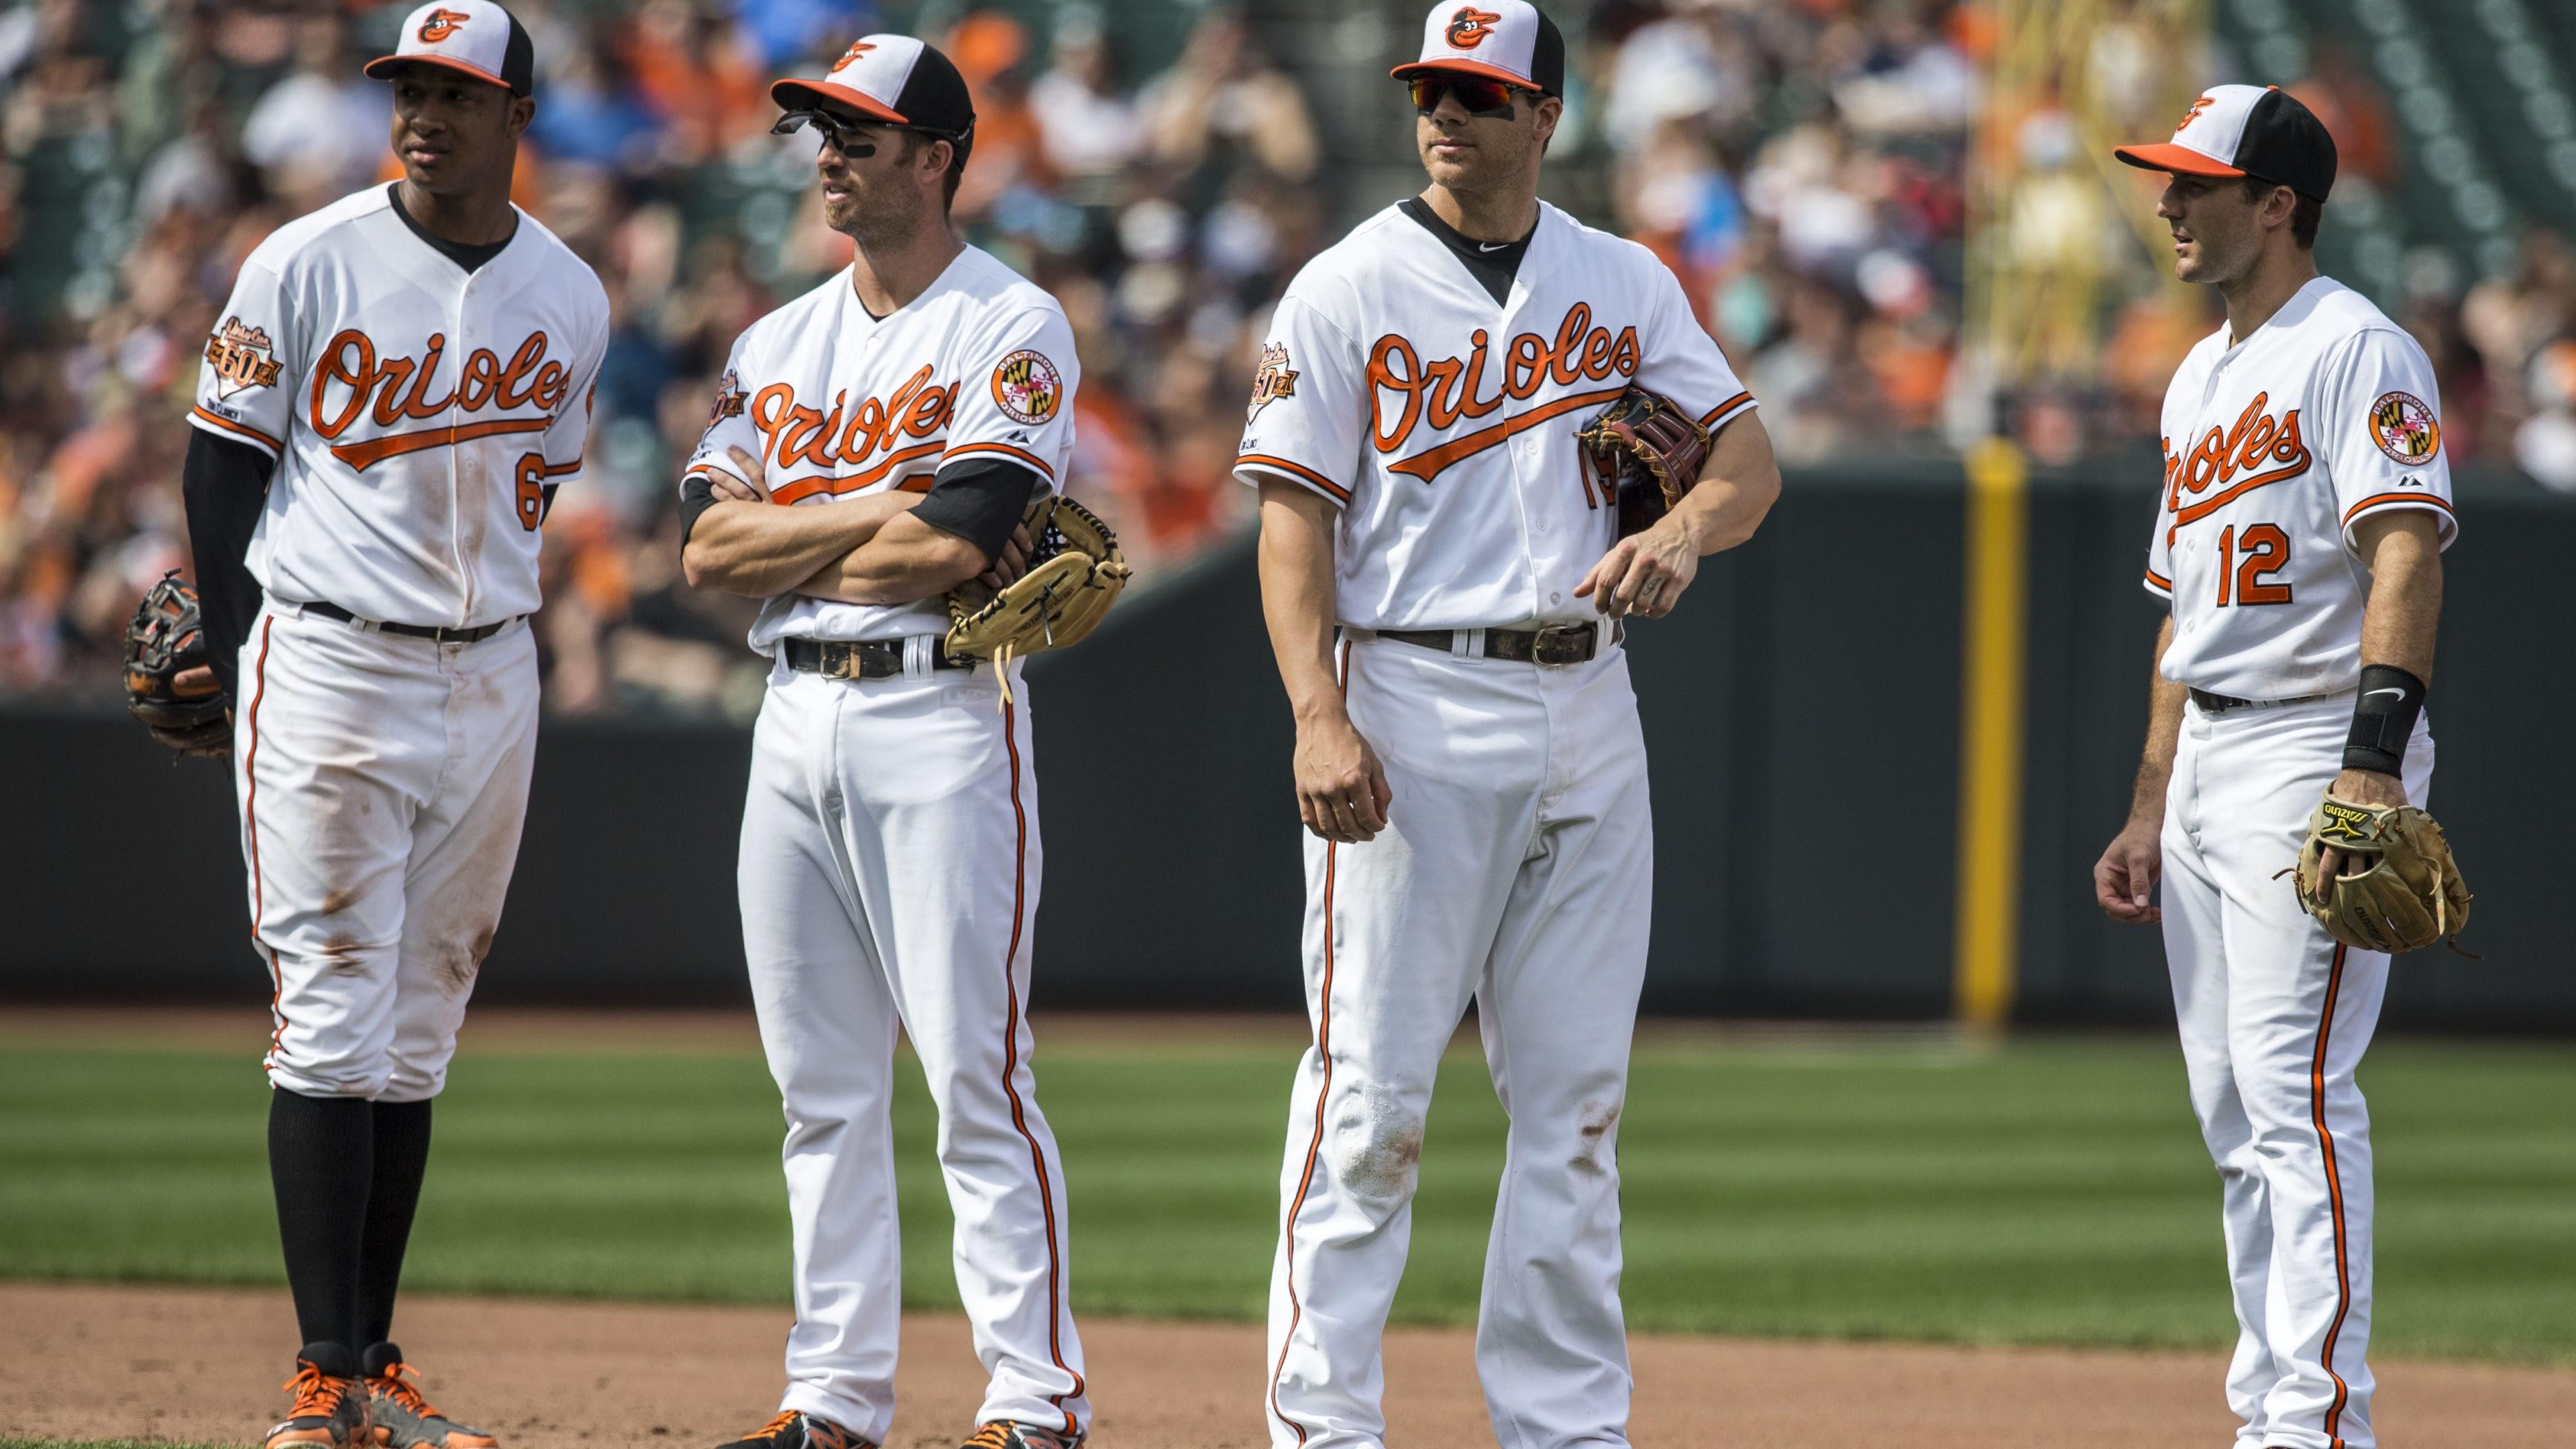 Wallpaper: Baltimore Orioles Infielders Baseball Players. Ultra HD 4K  3840×2160